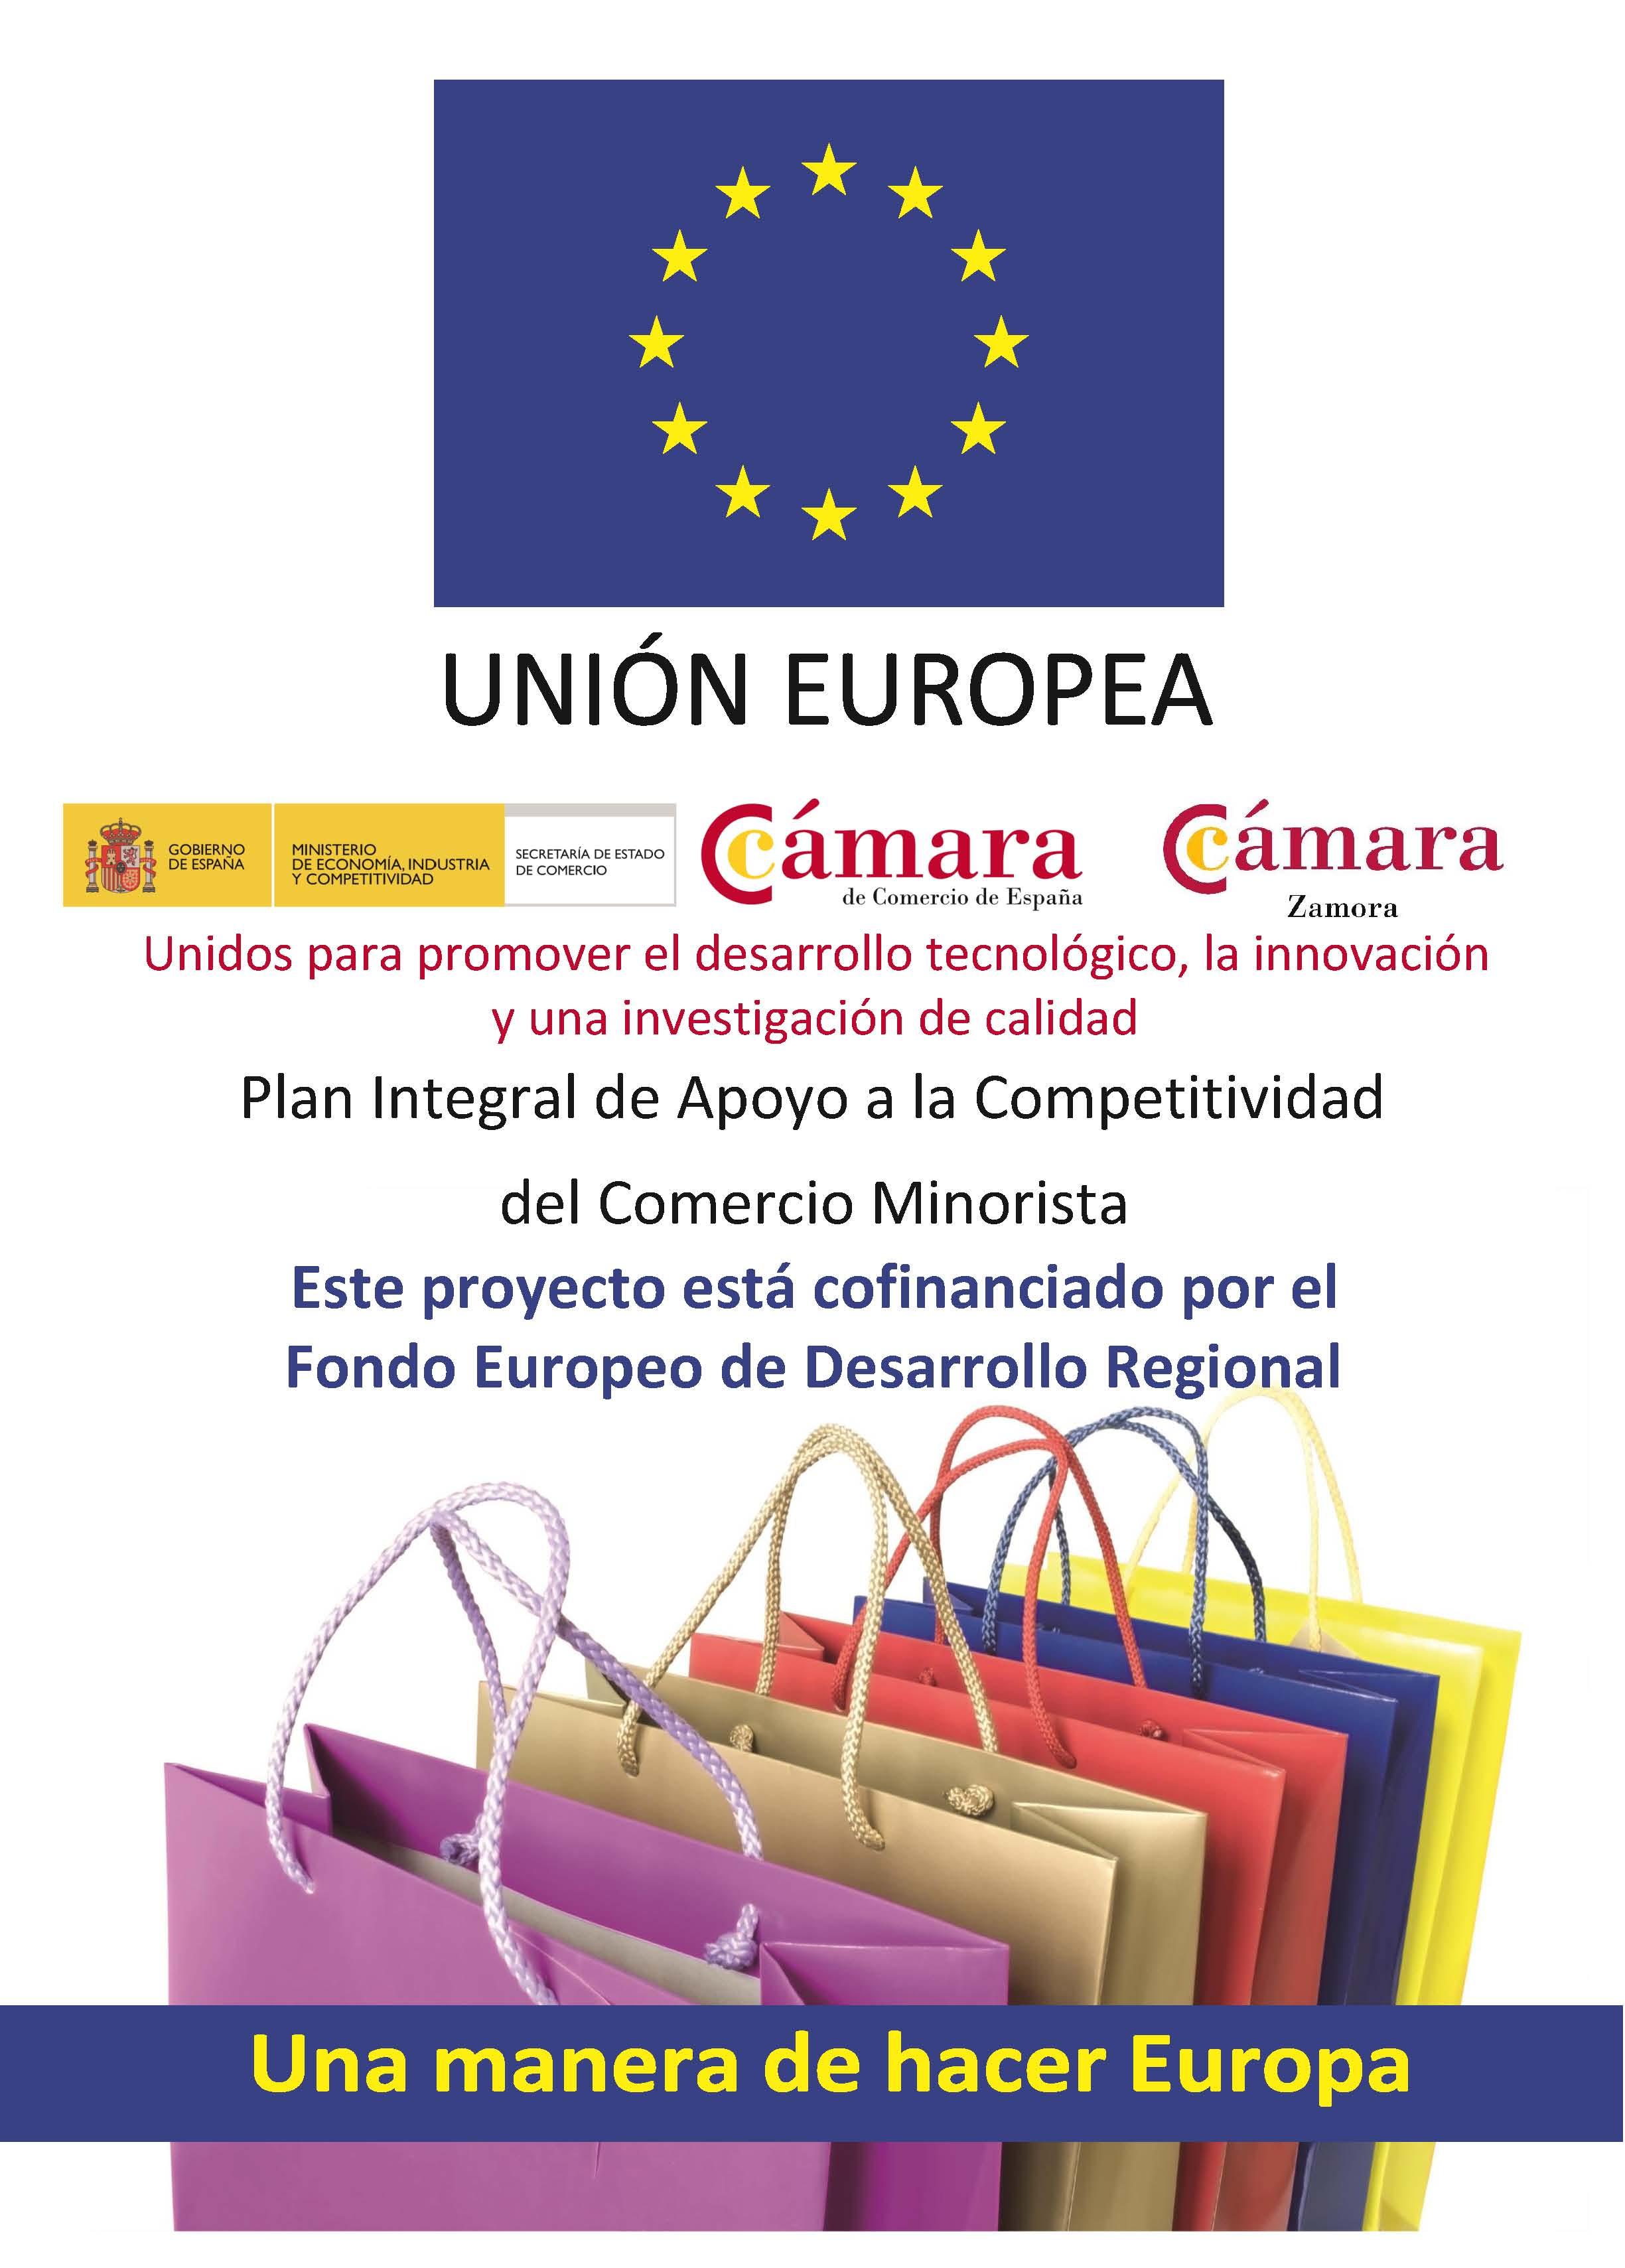 Plan Integral de Apoyo al Comercio Minorista Cámara Zamora